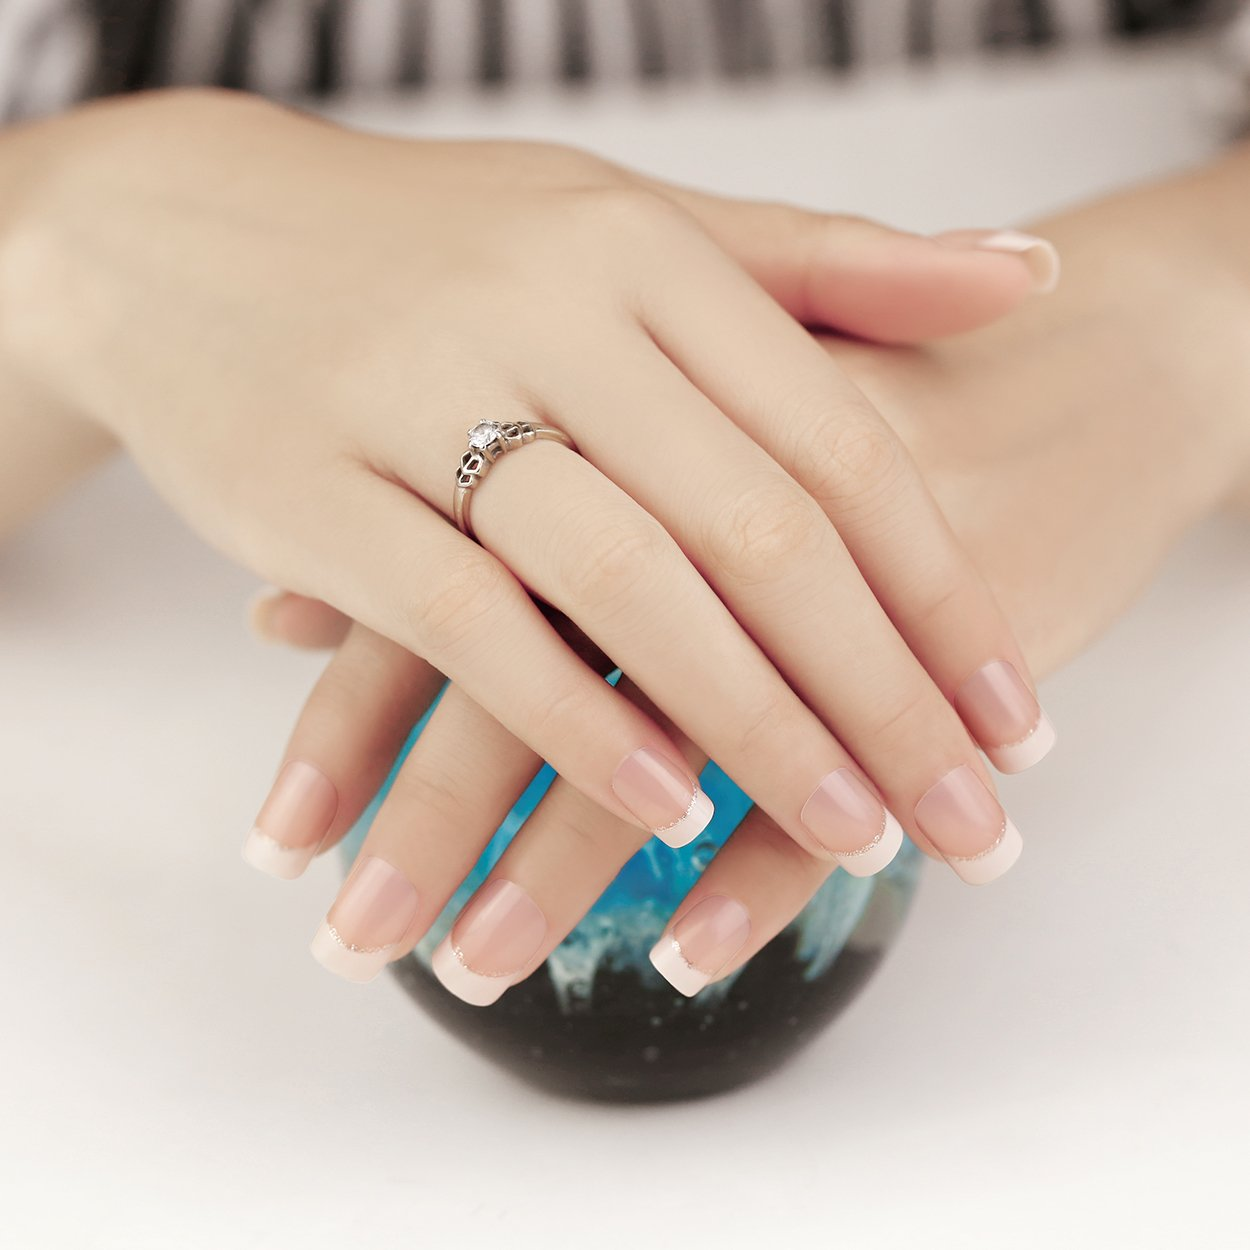 Useful Elegant Touch Nails 100% Guarantee Nail Care, Manicure & Pedicure